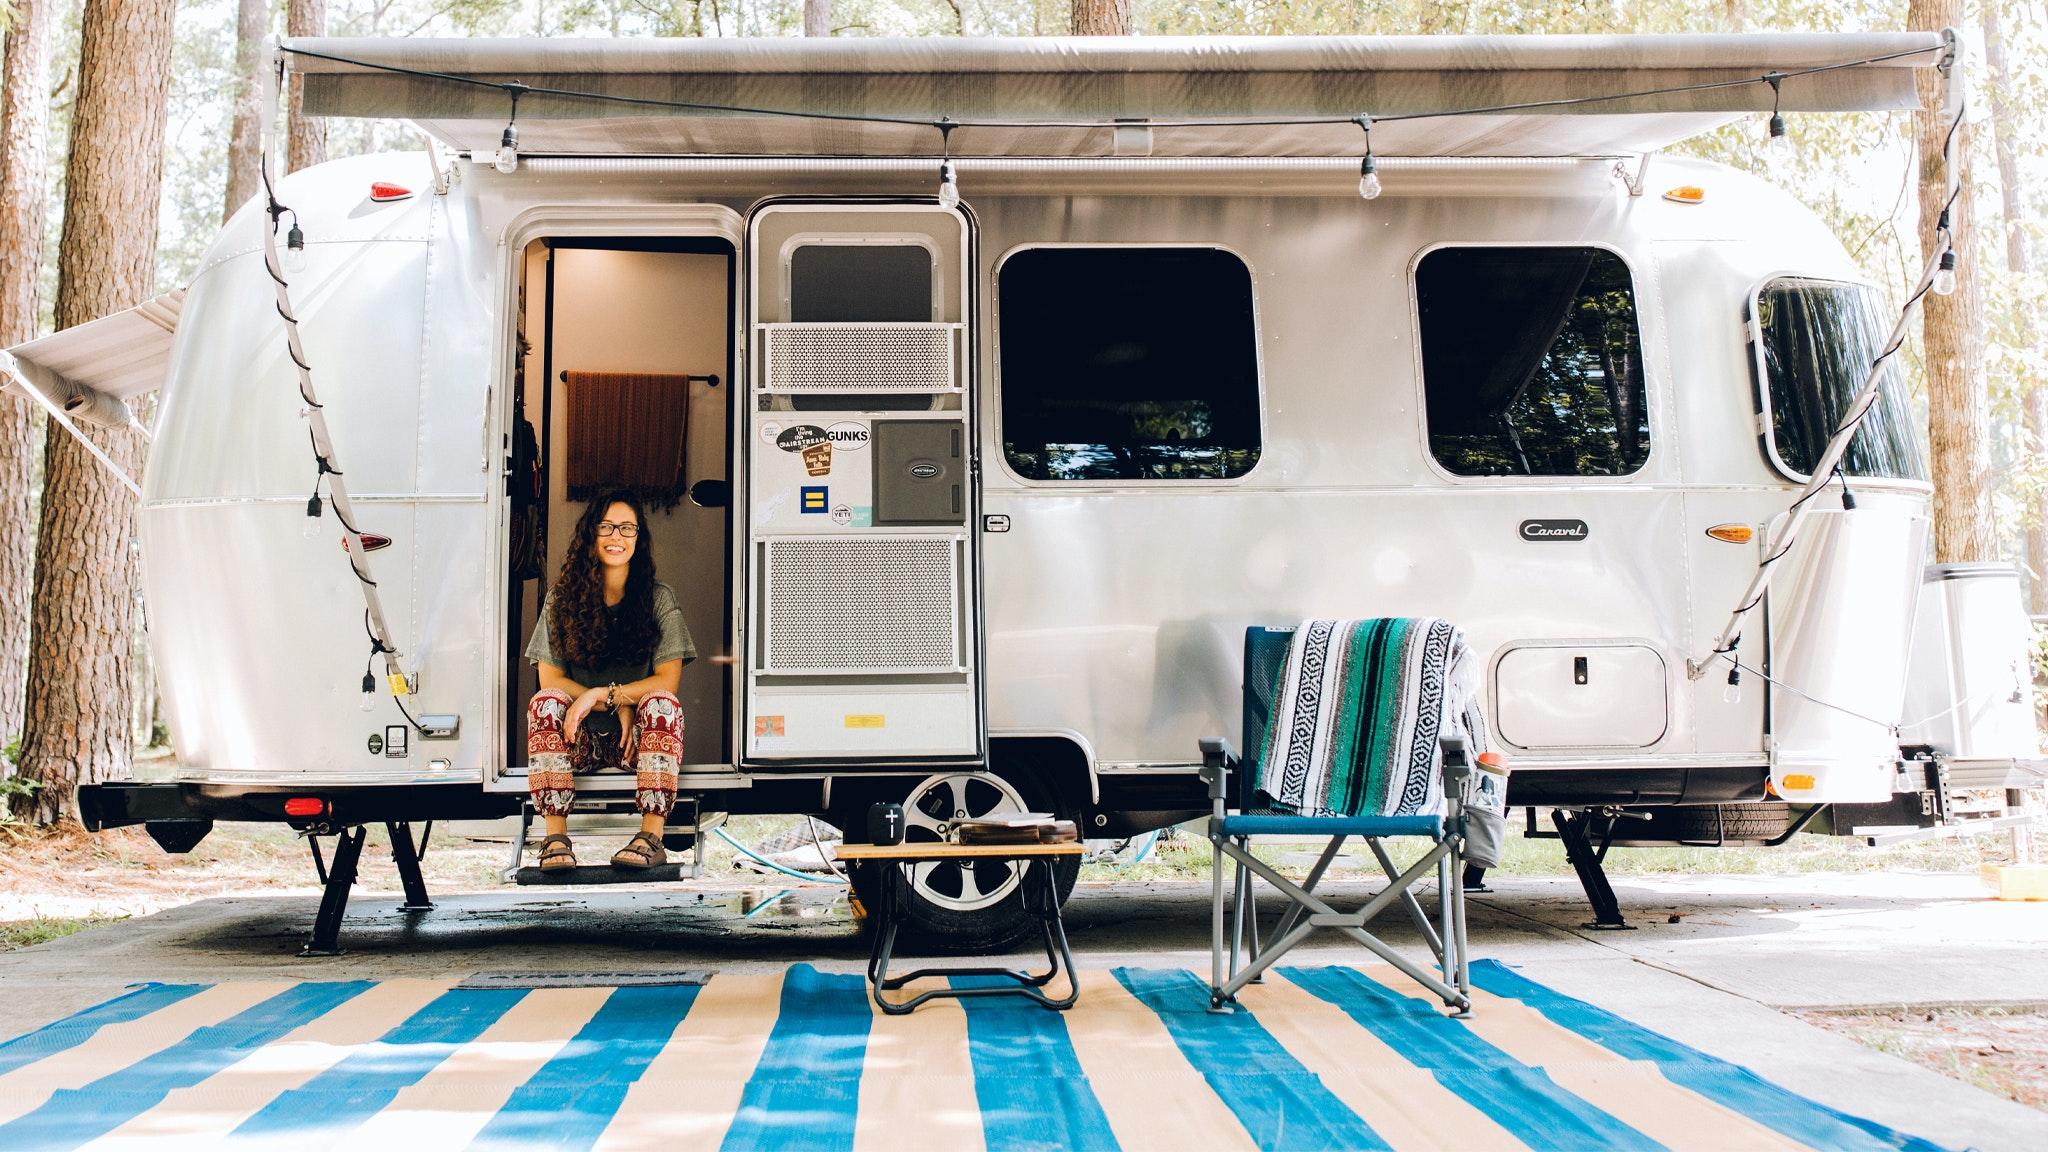 Airstream Ambassador Marisa sitting on the steps of her Airstream Travel Trailer